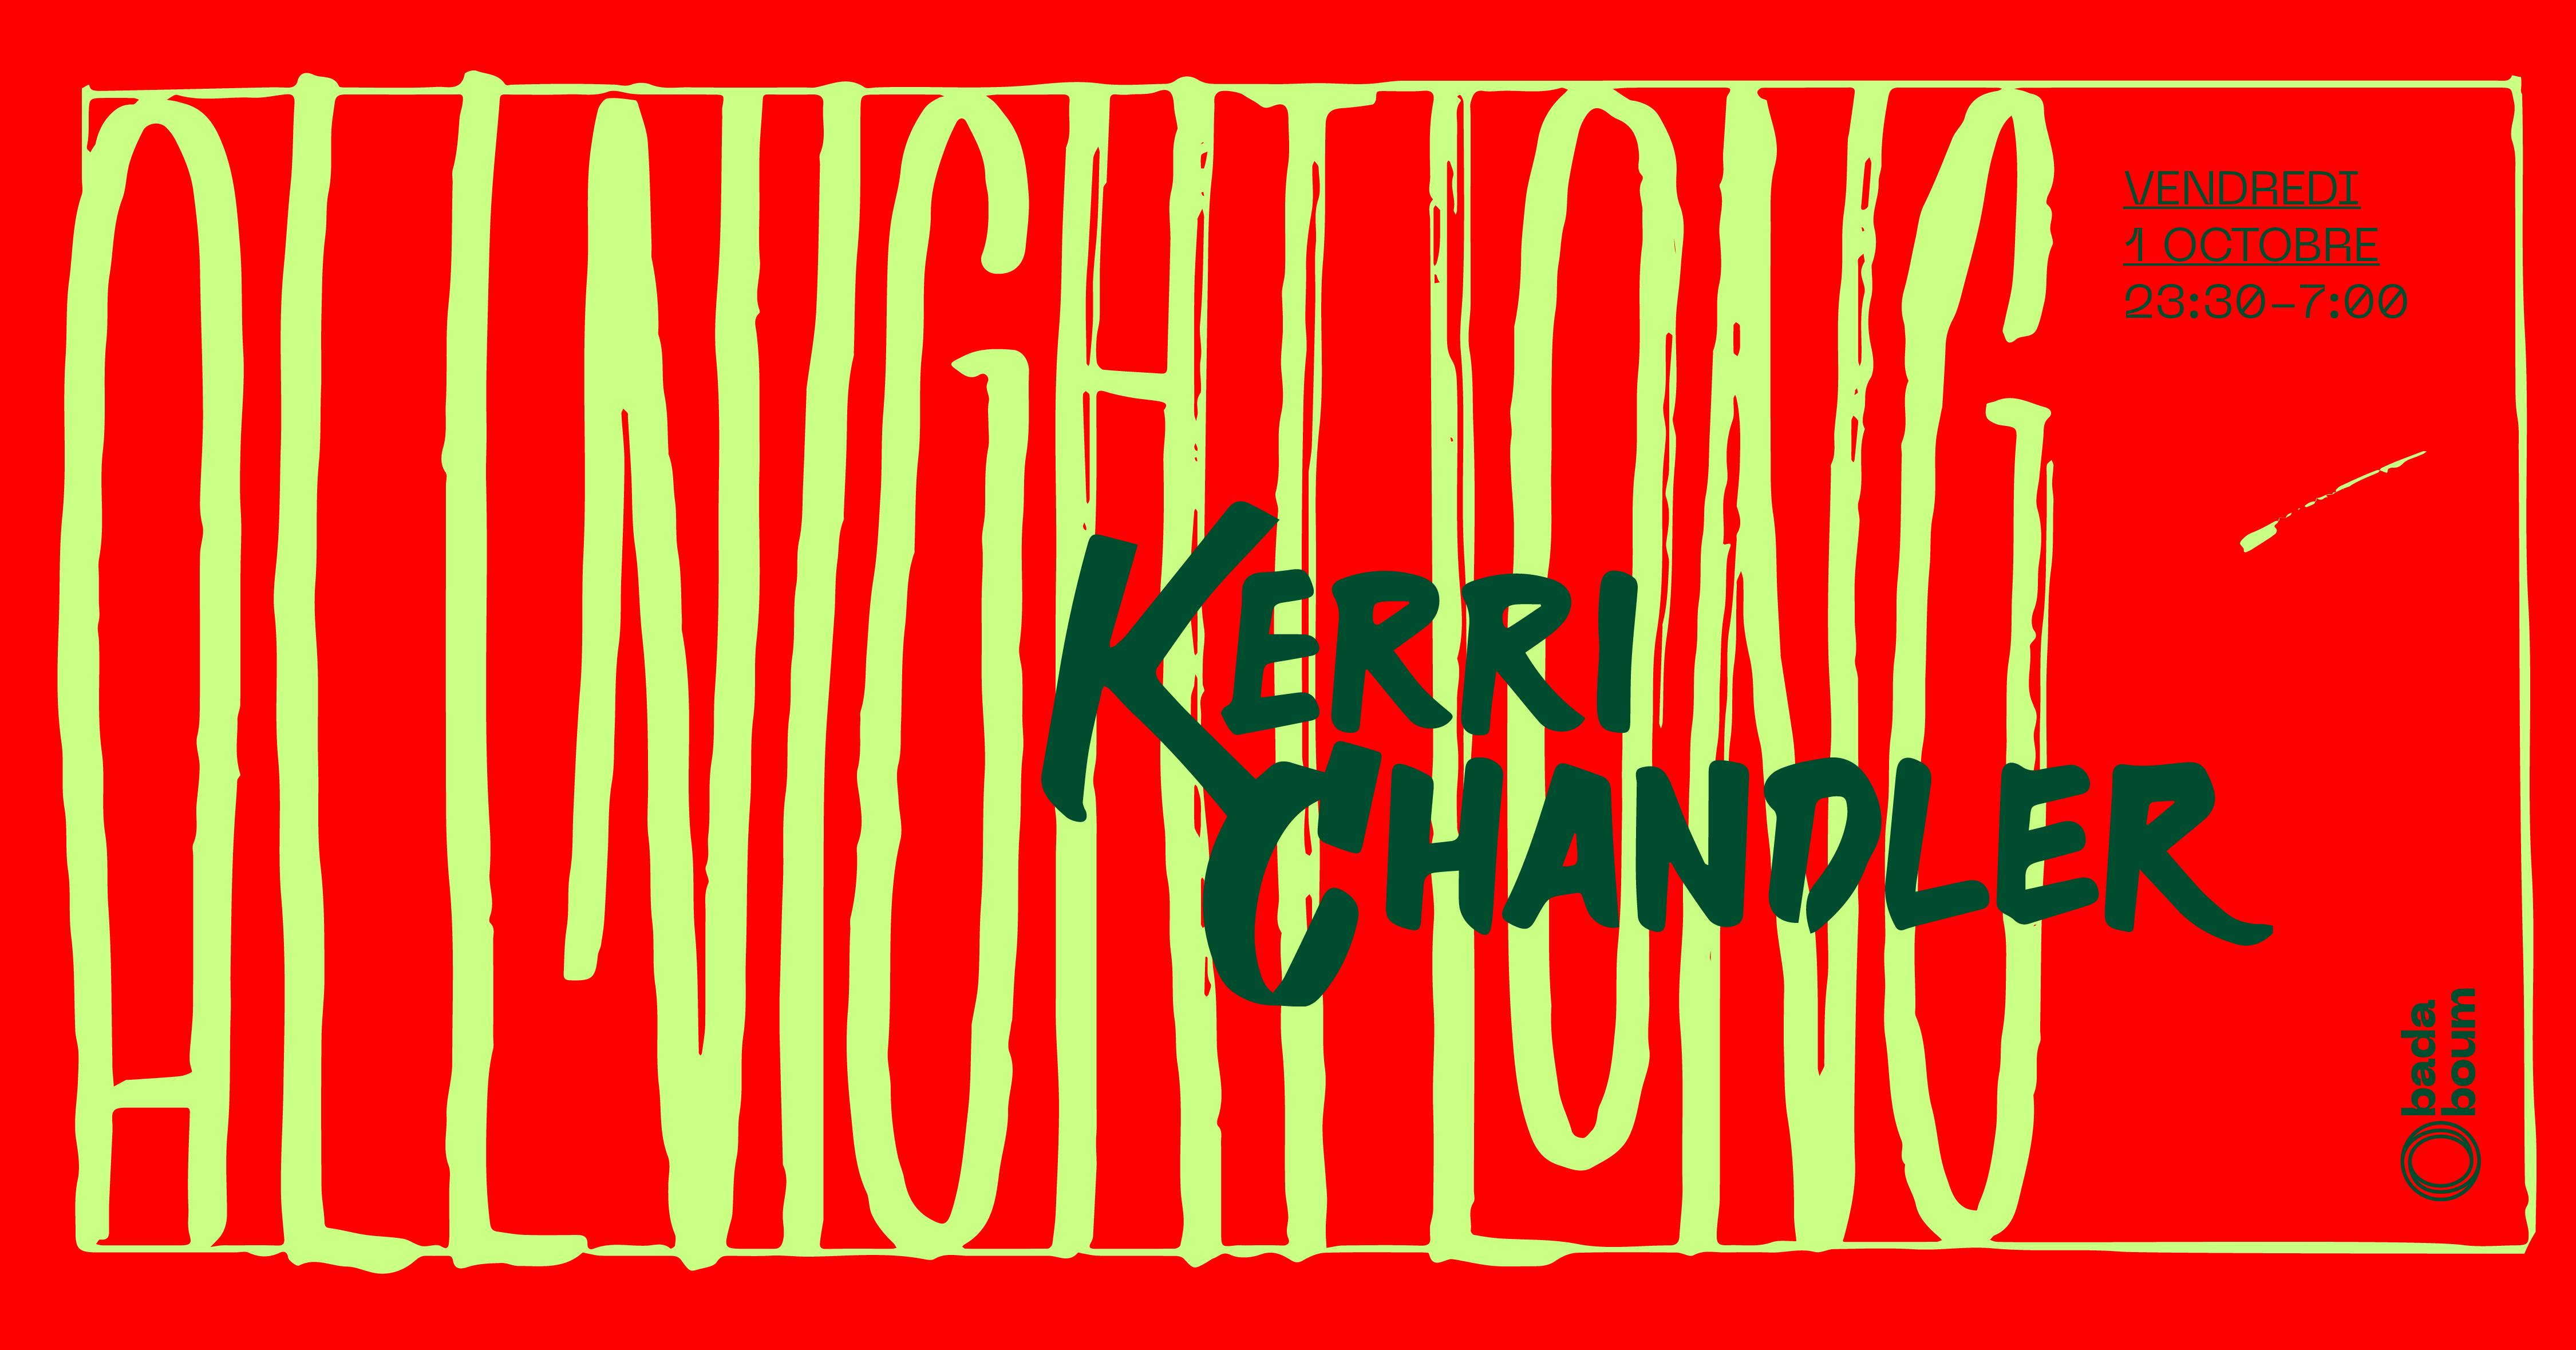 Badaboum Club : Kerri Chandler all night long